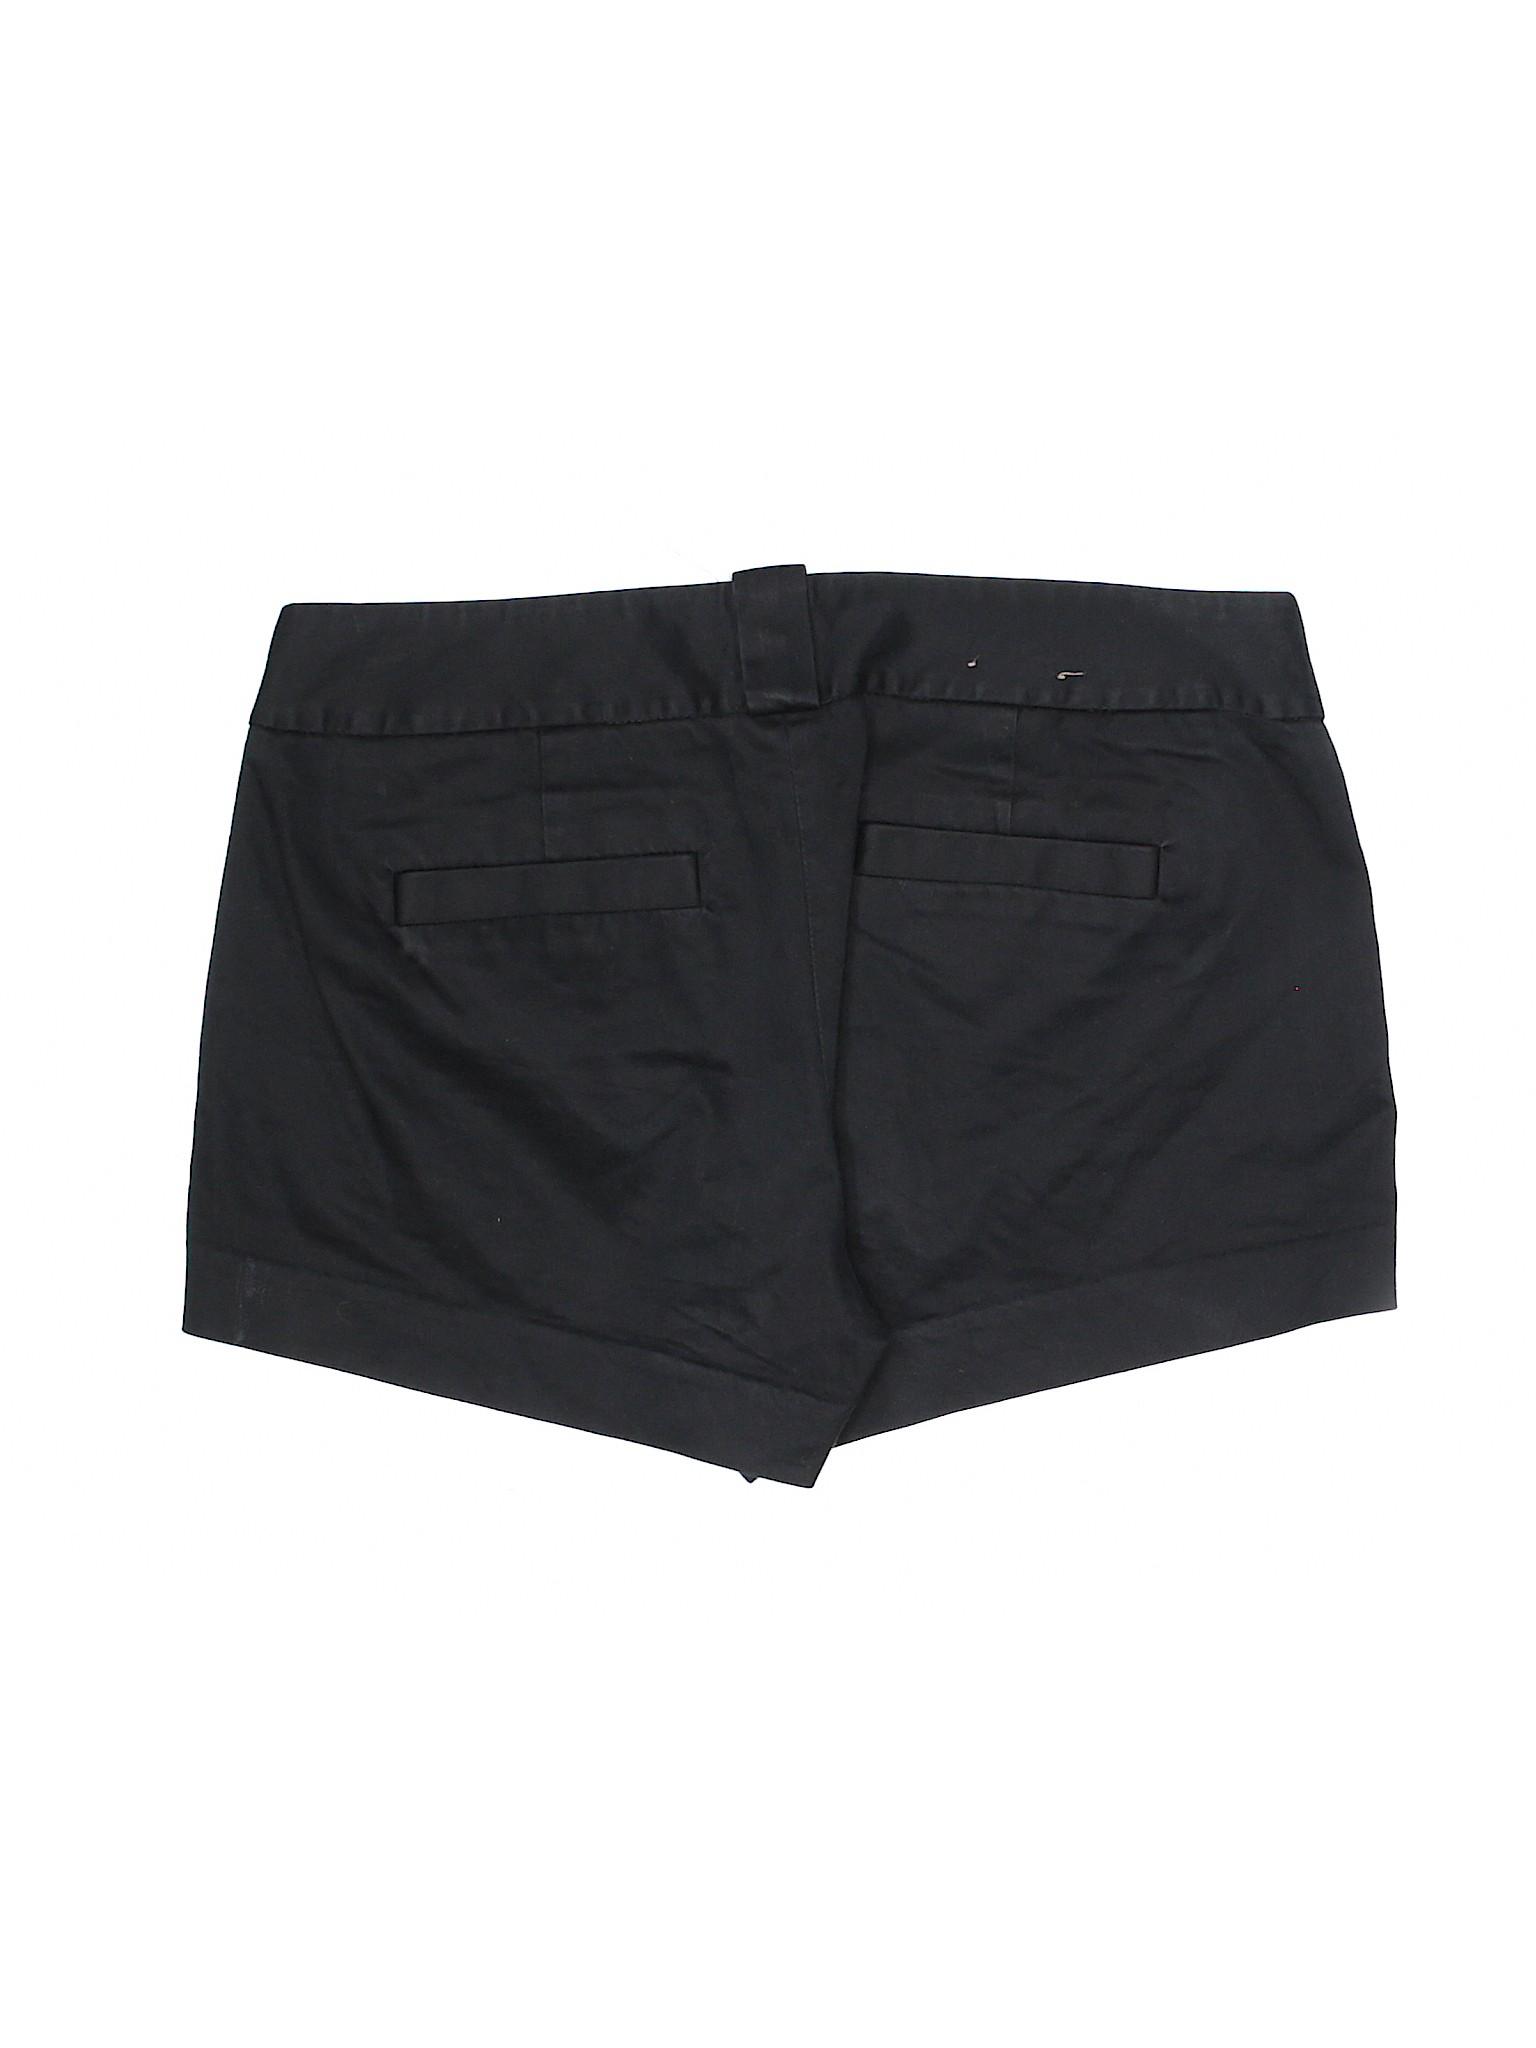 Factory Store Boutique Khaki Shorts Crew leisure J qBBnfw7gZ